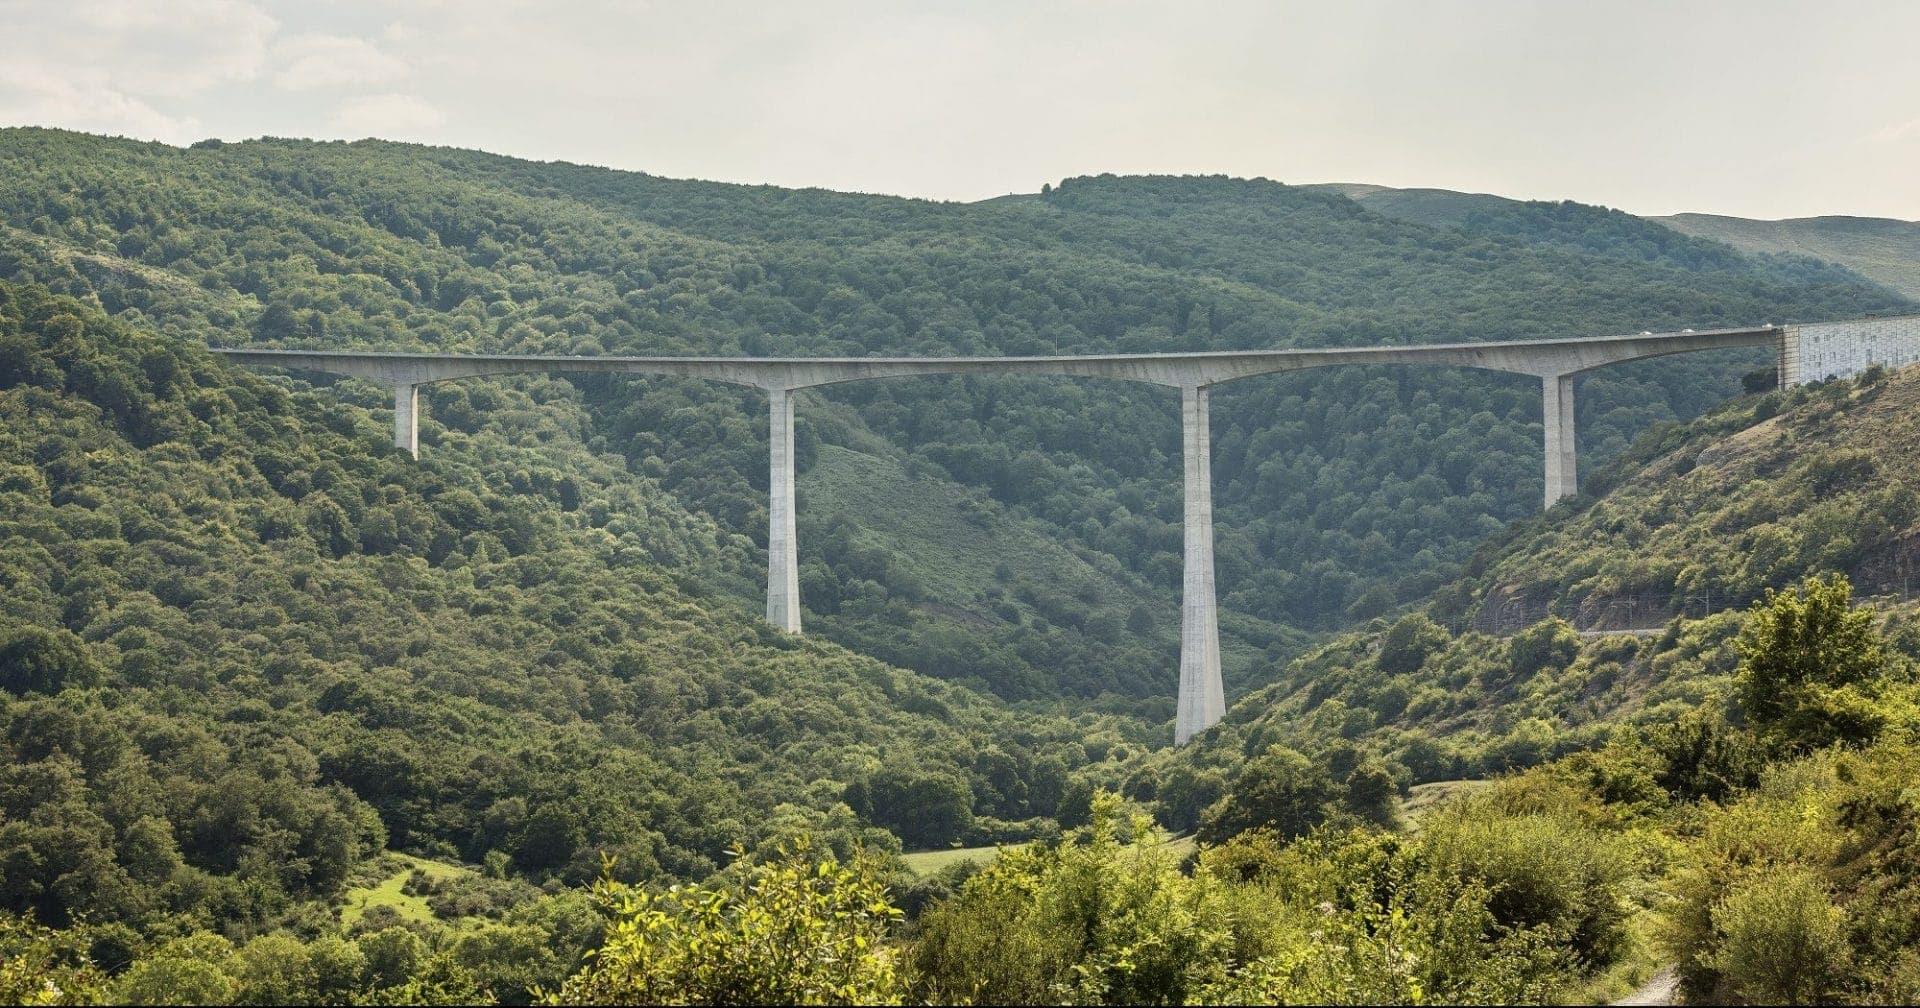 Bridge spans countryside